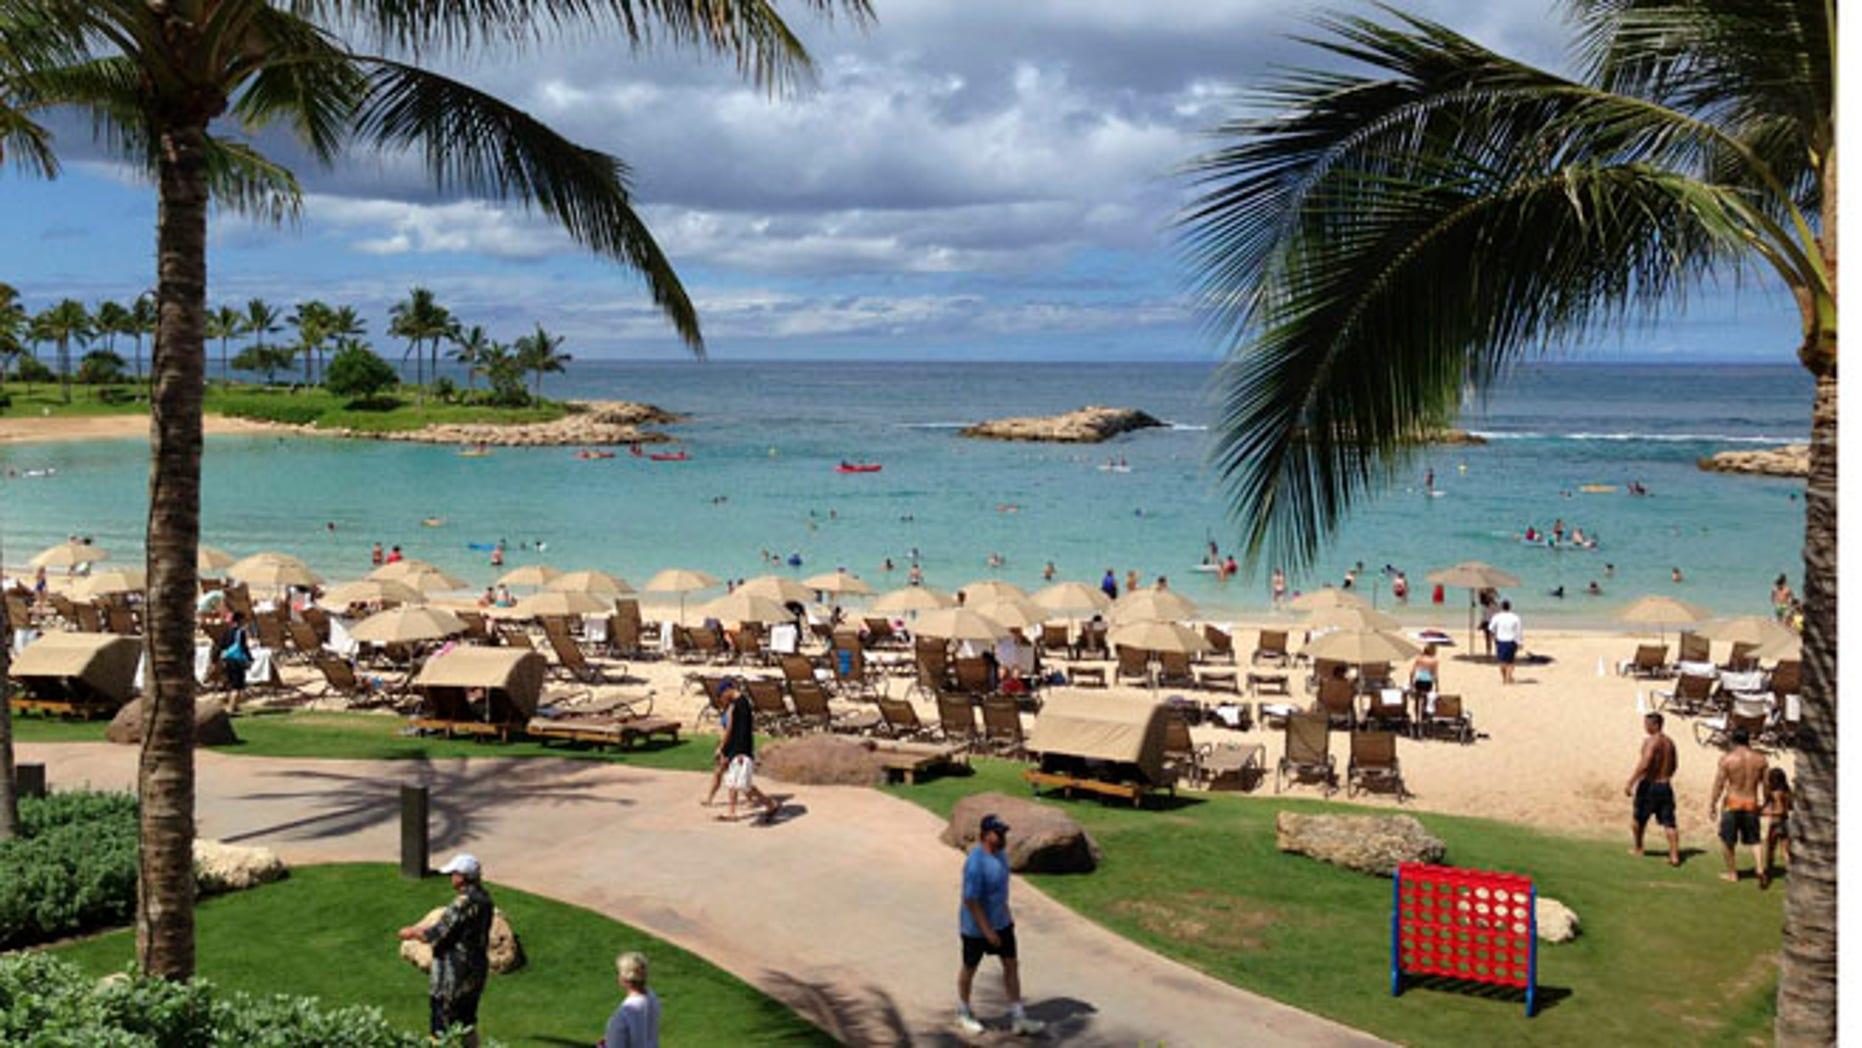 July 29, 2013: Tourists and locals play on Ko'Olina beach on the island of Oahu, Hawaii.